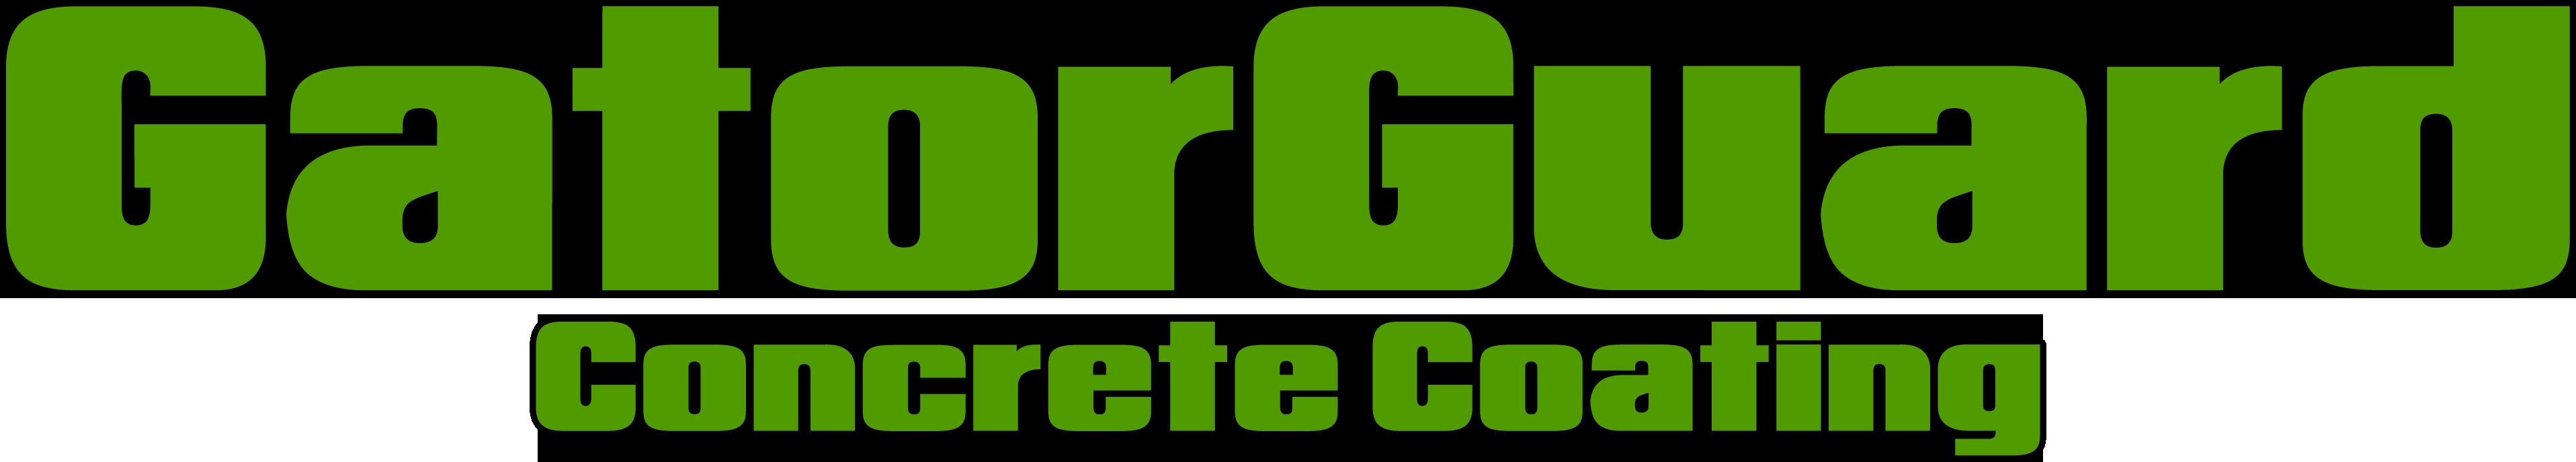 GatorGuard logo